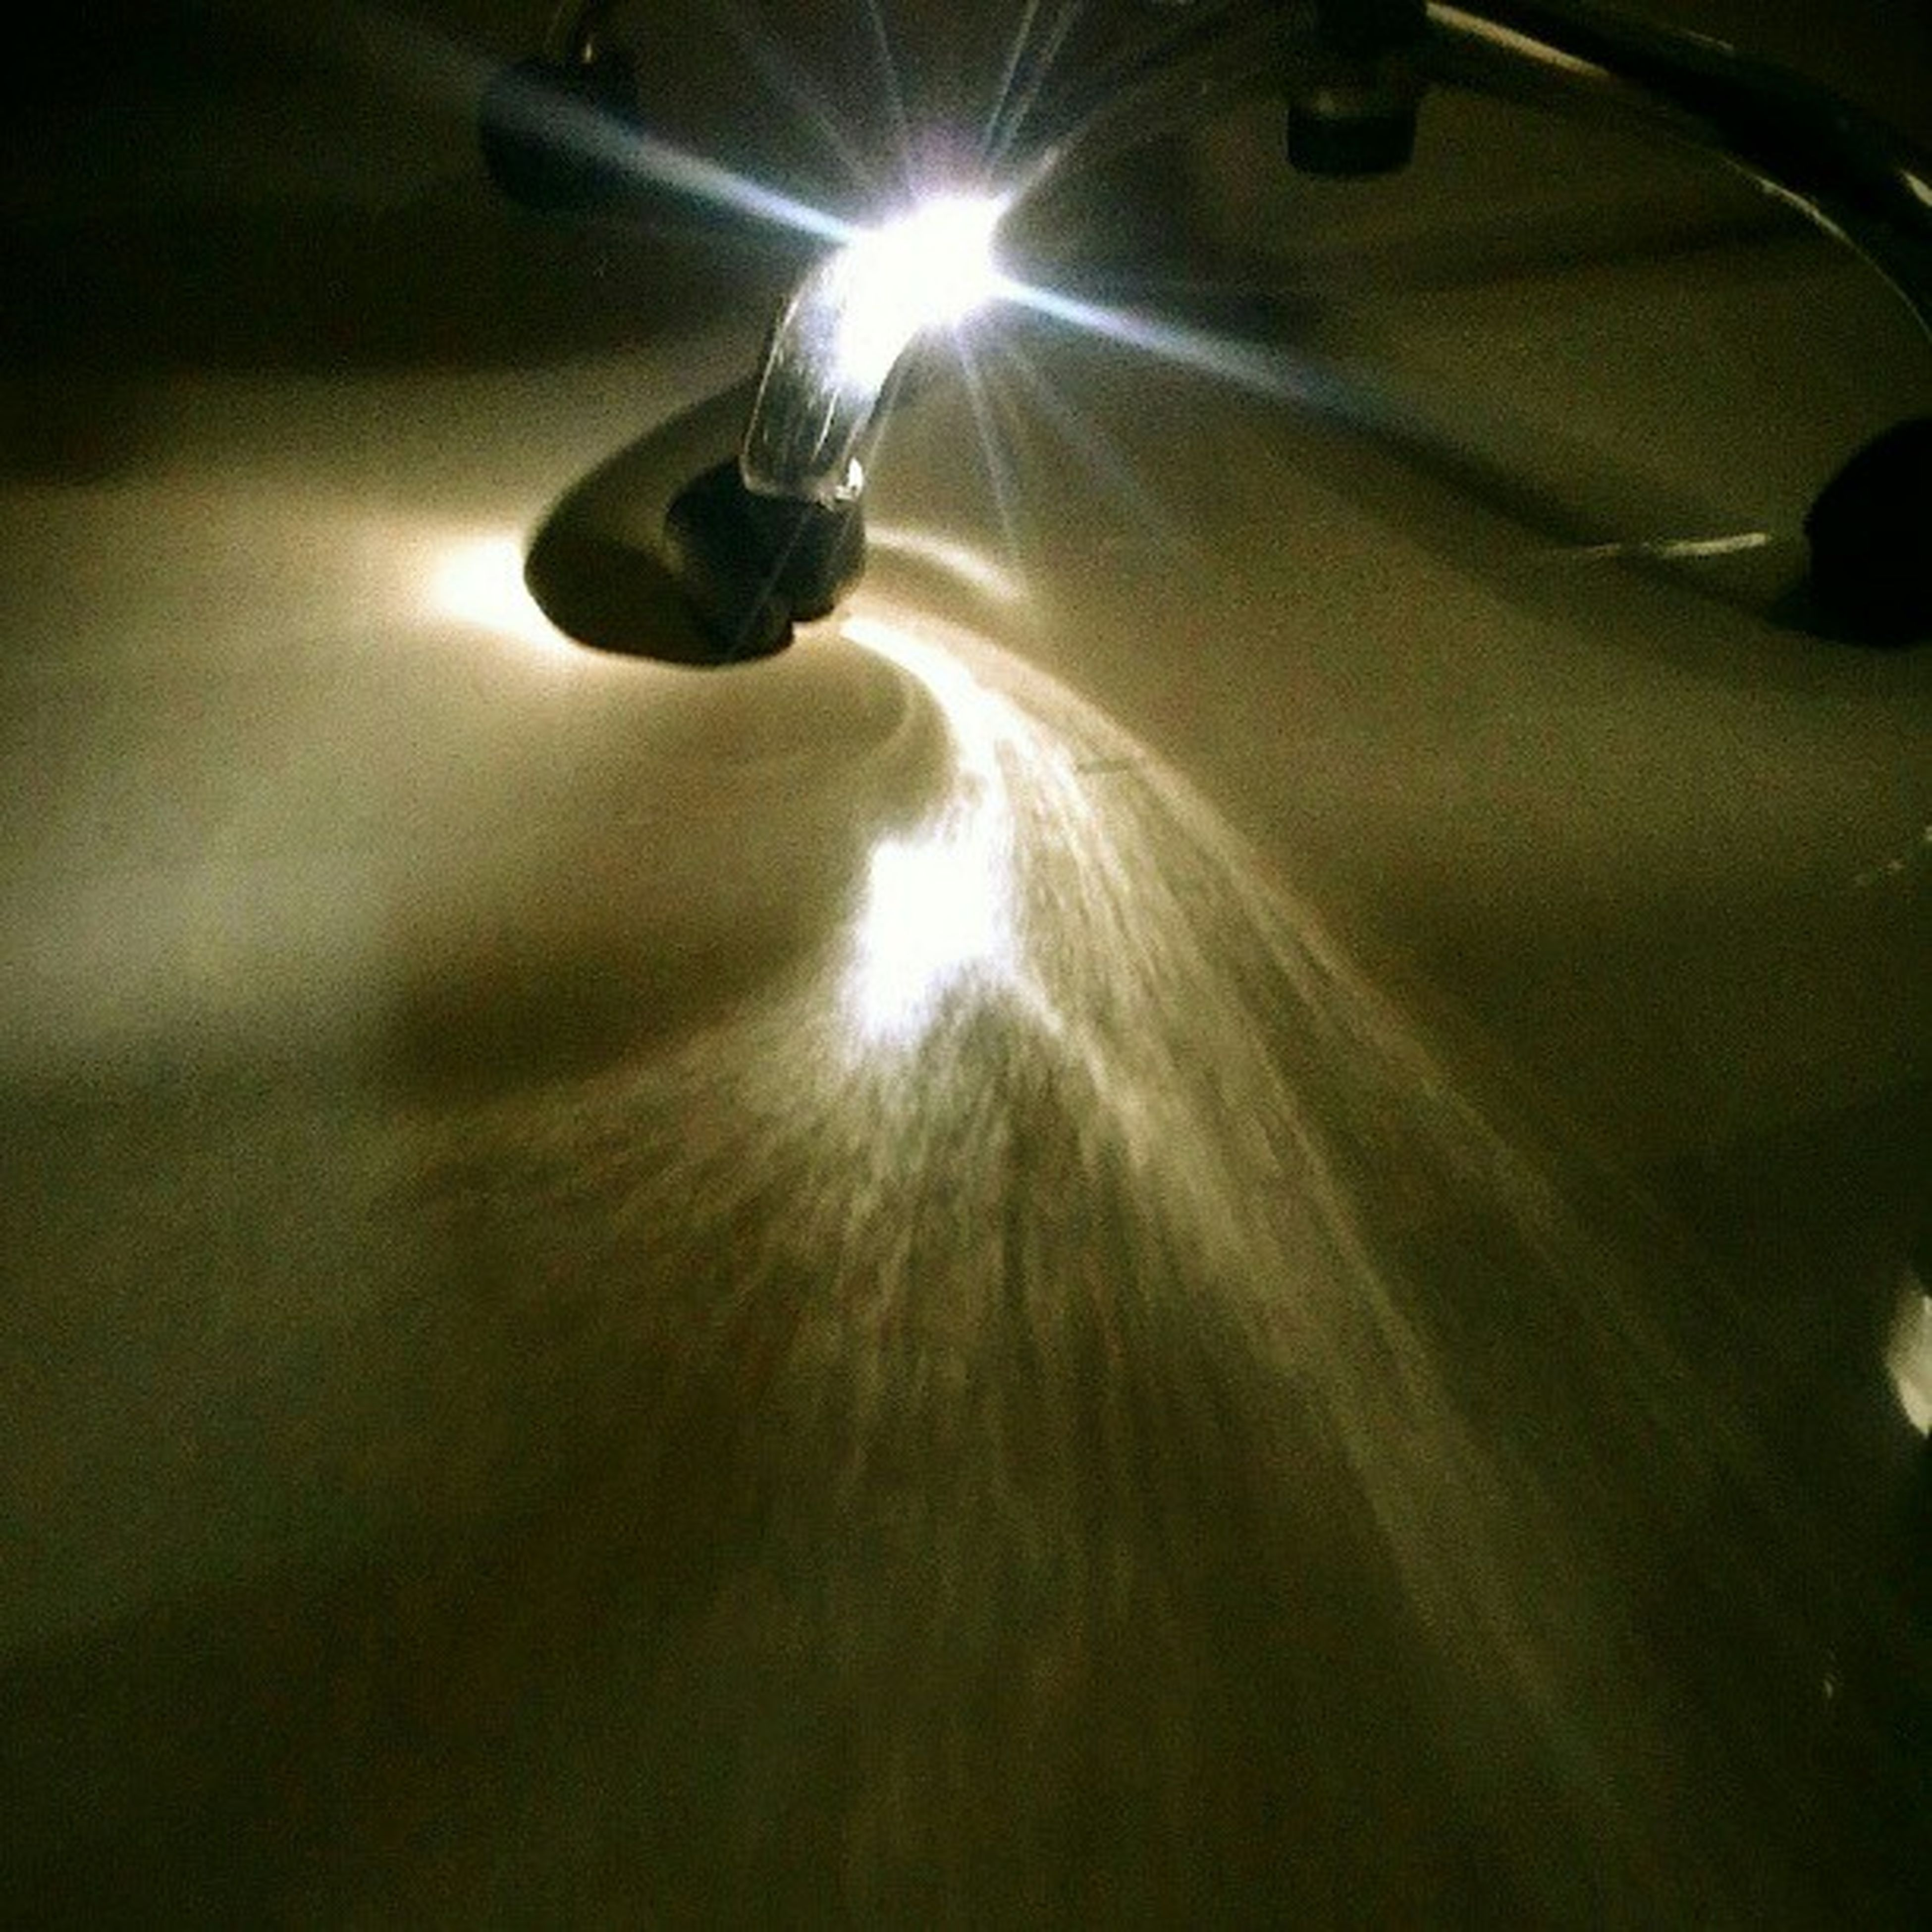 lens flare, sun, sunbeam, sunlight, night, glowing, low angle view, light - natural phenomenon, no people, illuminated, bright, sunny, outdoors, close-up, nature, shiny, lighting equipment, back lit